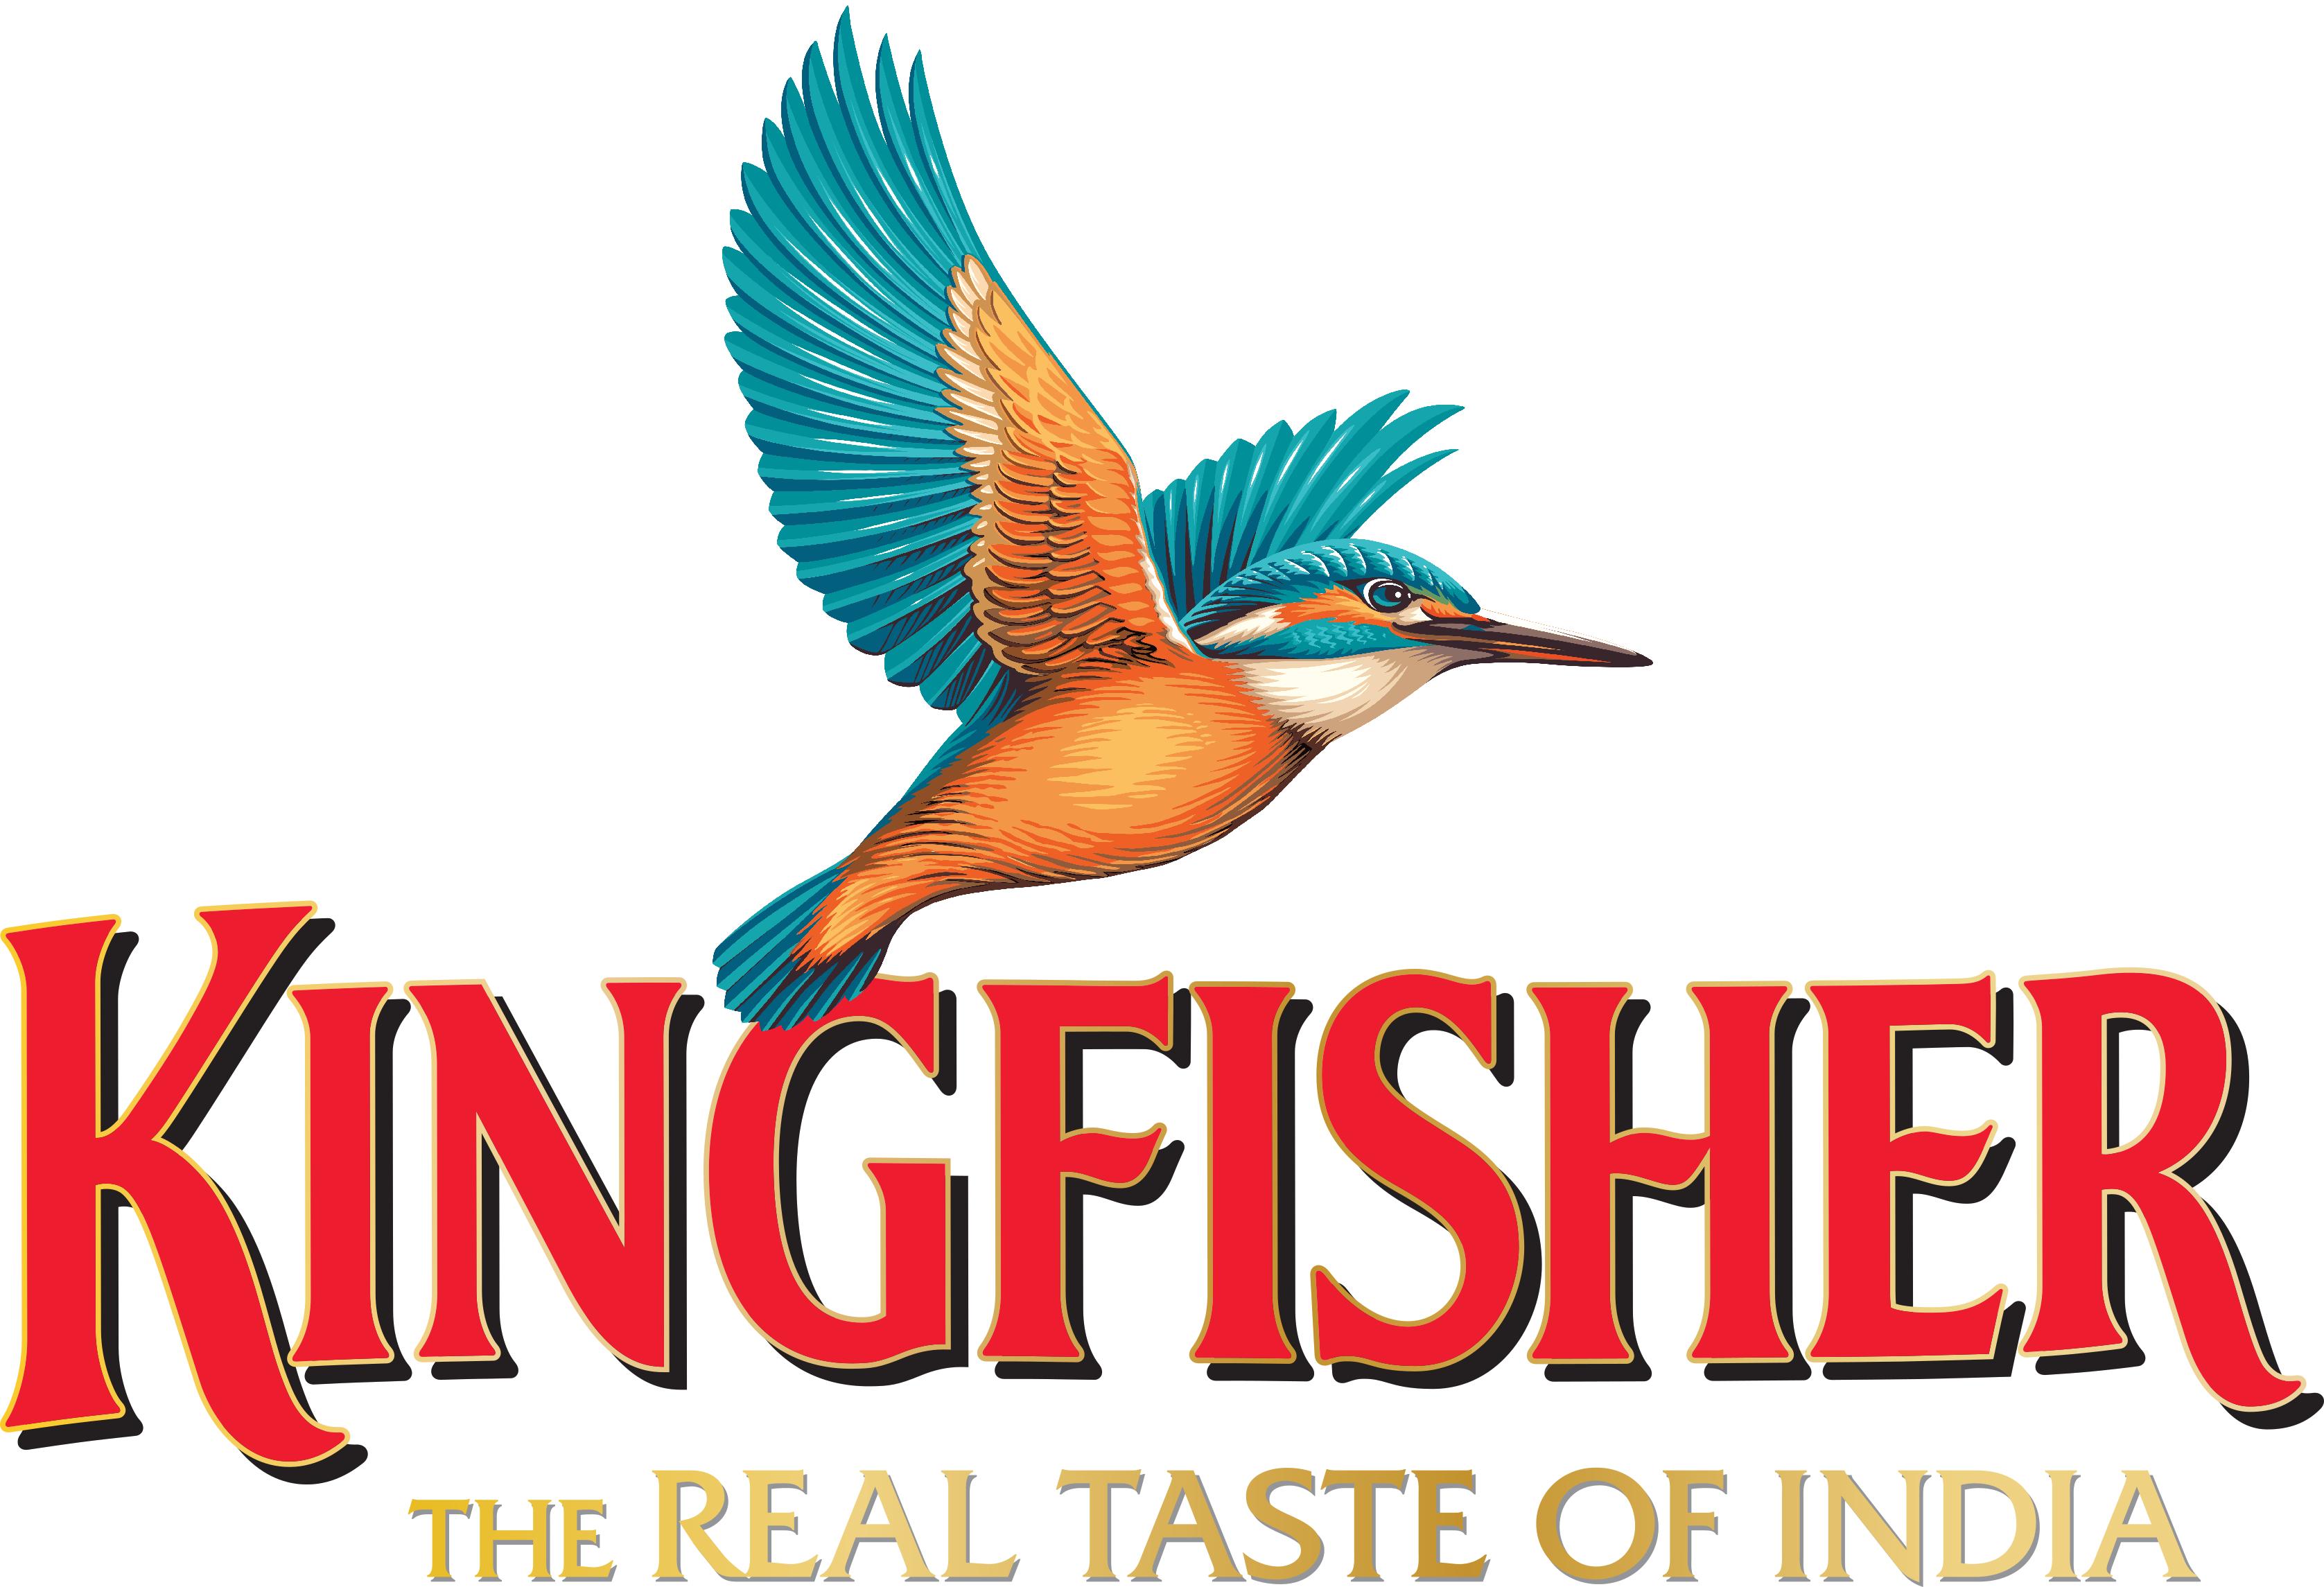 Kingfisher (beer)